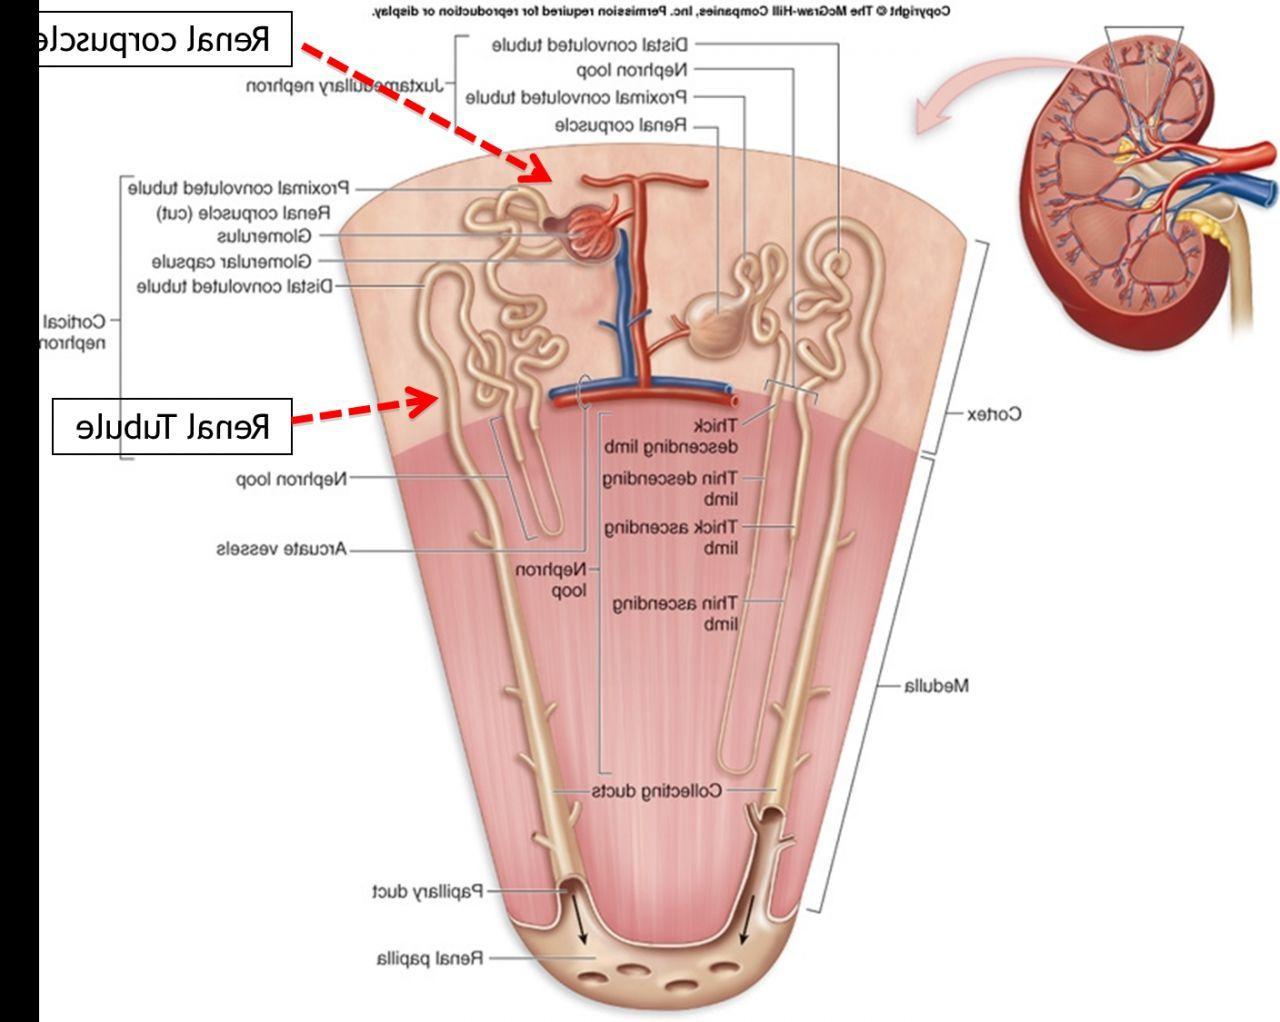 Human Kidney Anatomy Diagram | drawing references | Pinterest ...